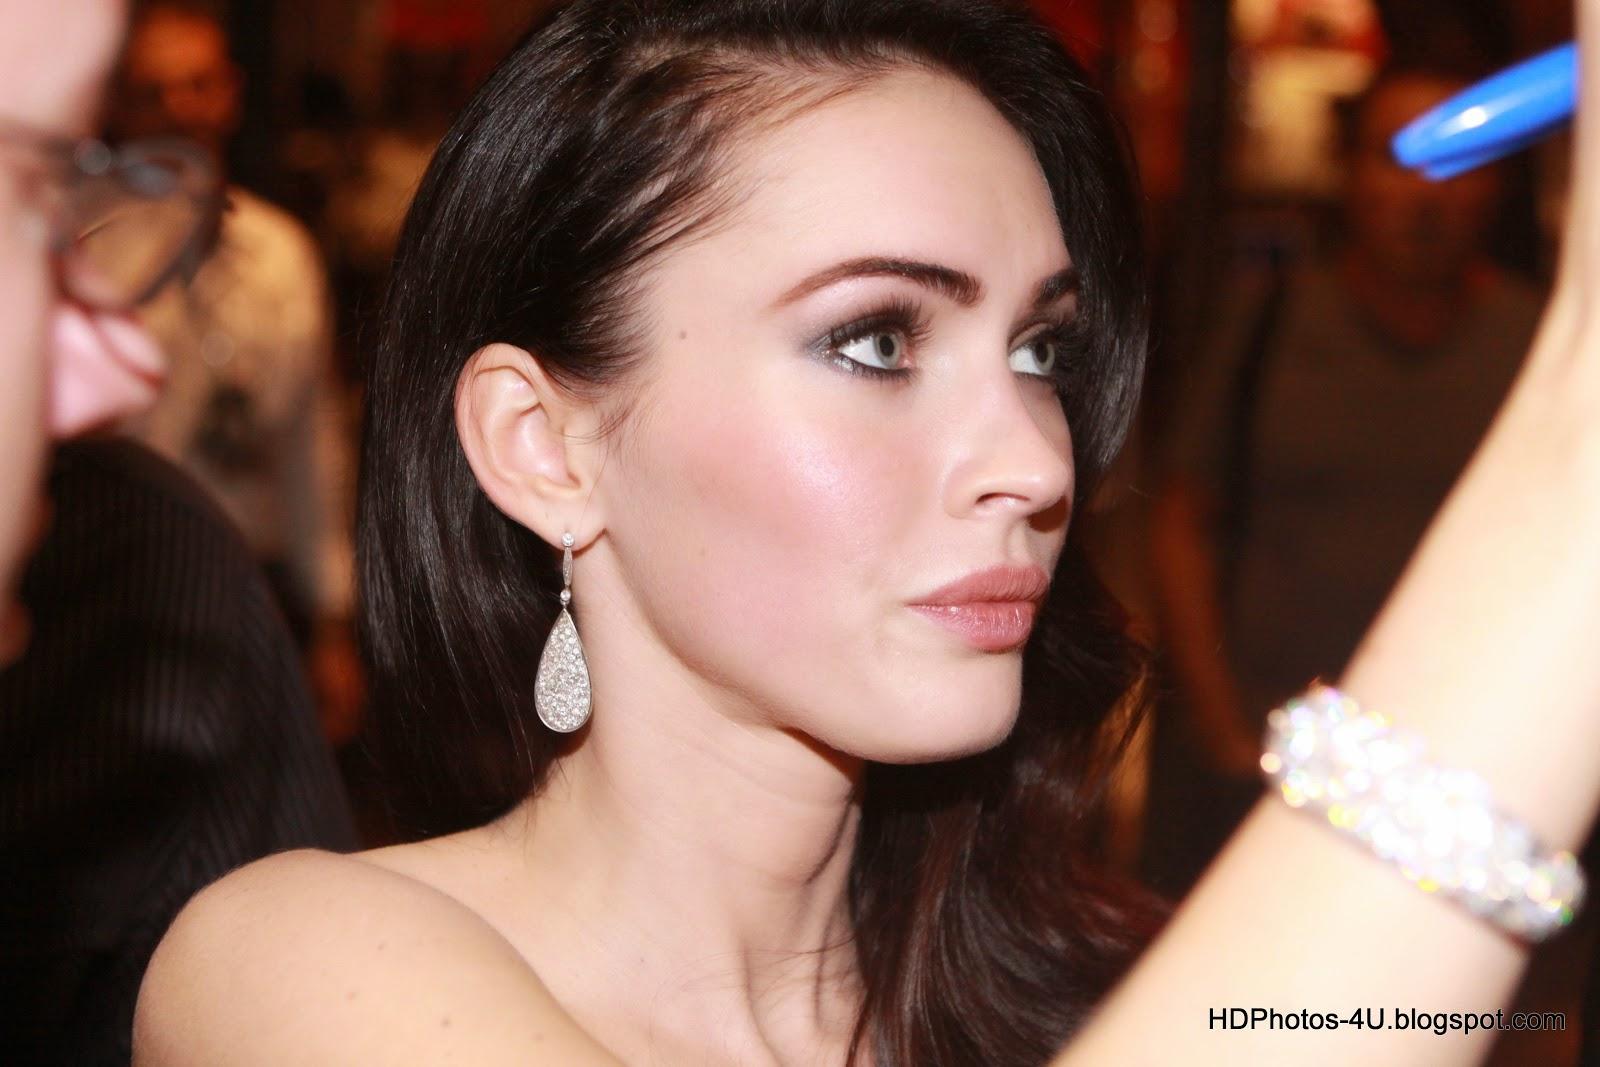 American Actress Megan Fox Full HD Photos & Wallpapers | Wallpapper